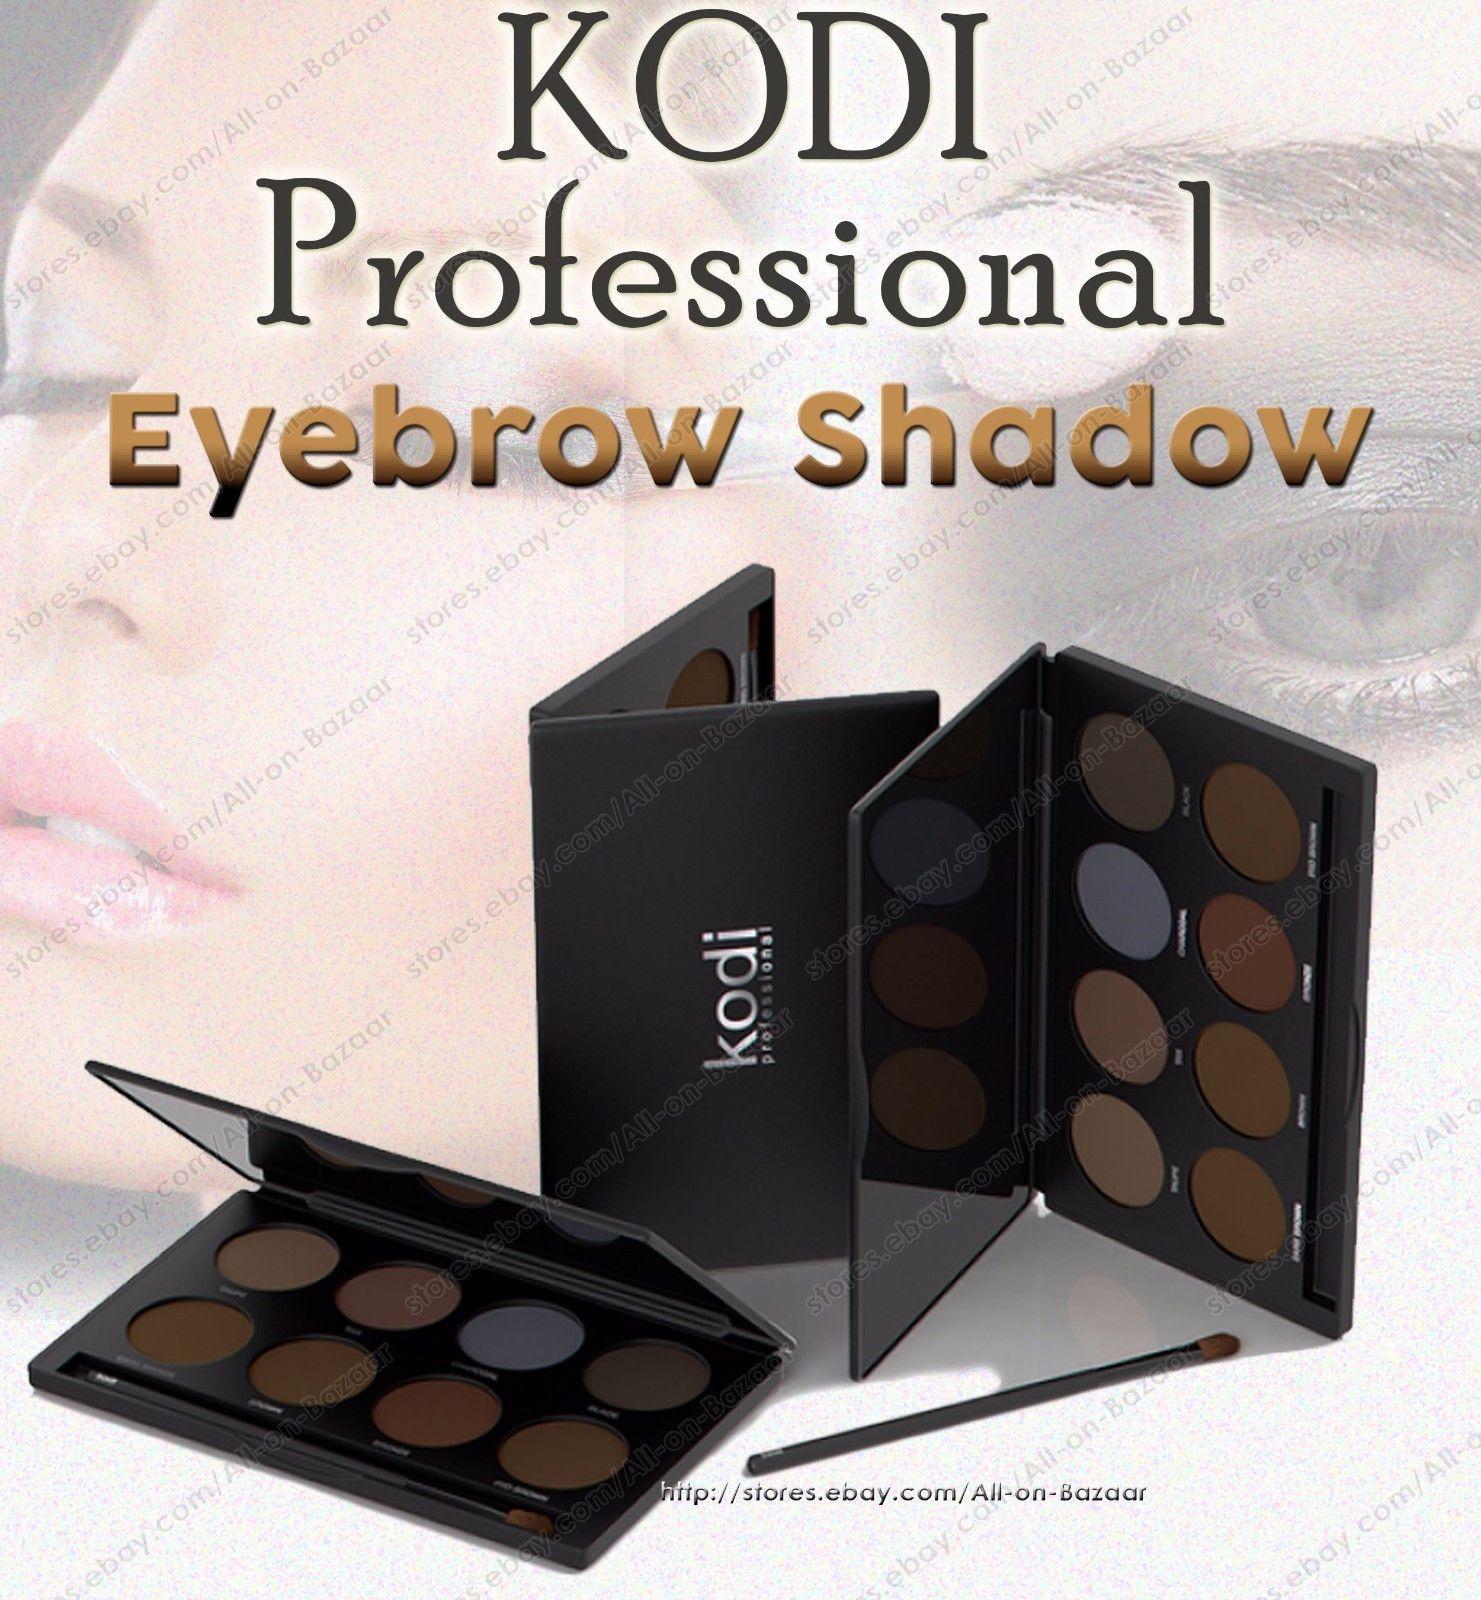 Kodi professinal Eyeshadow Eye Shadow Palette & Makeup Cosmetic Brush Set - $138.00